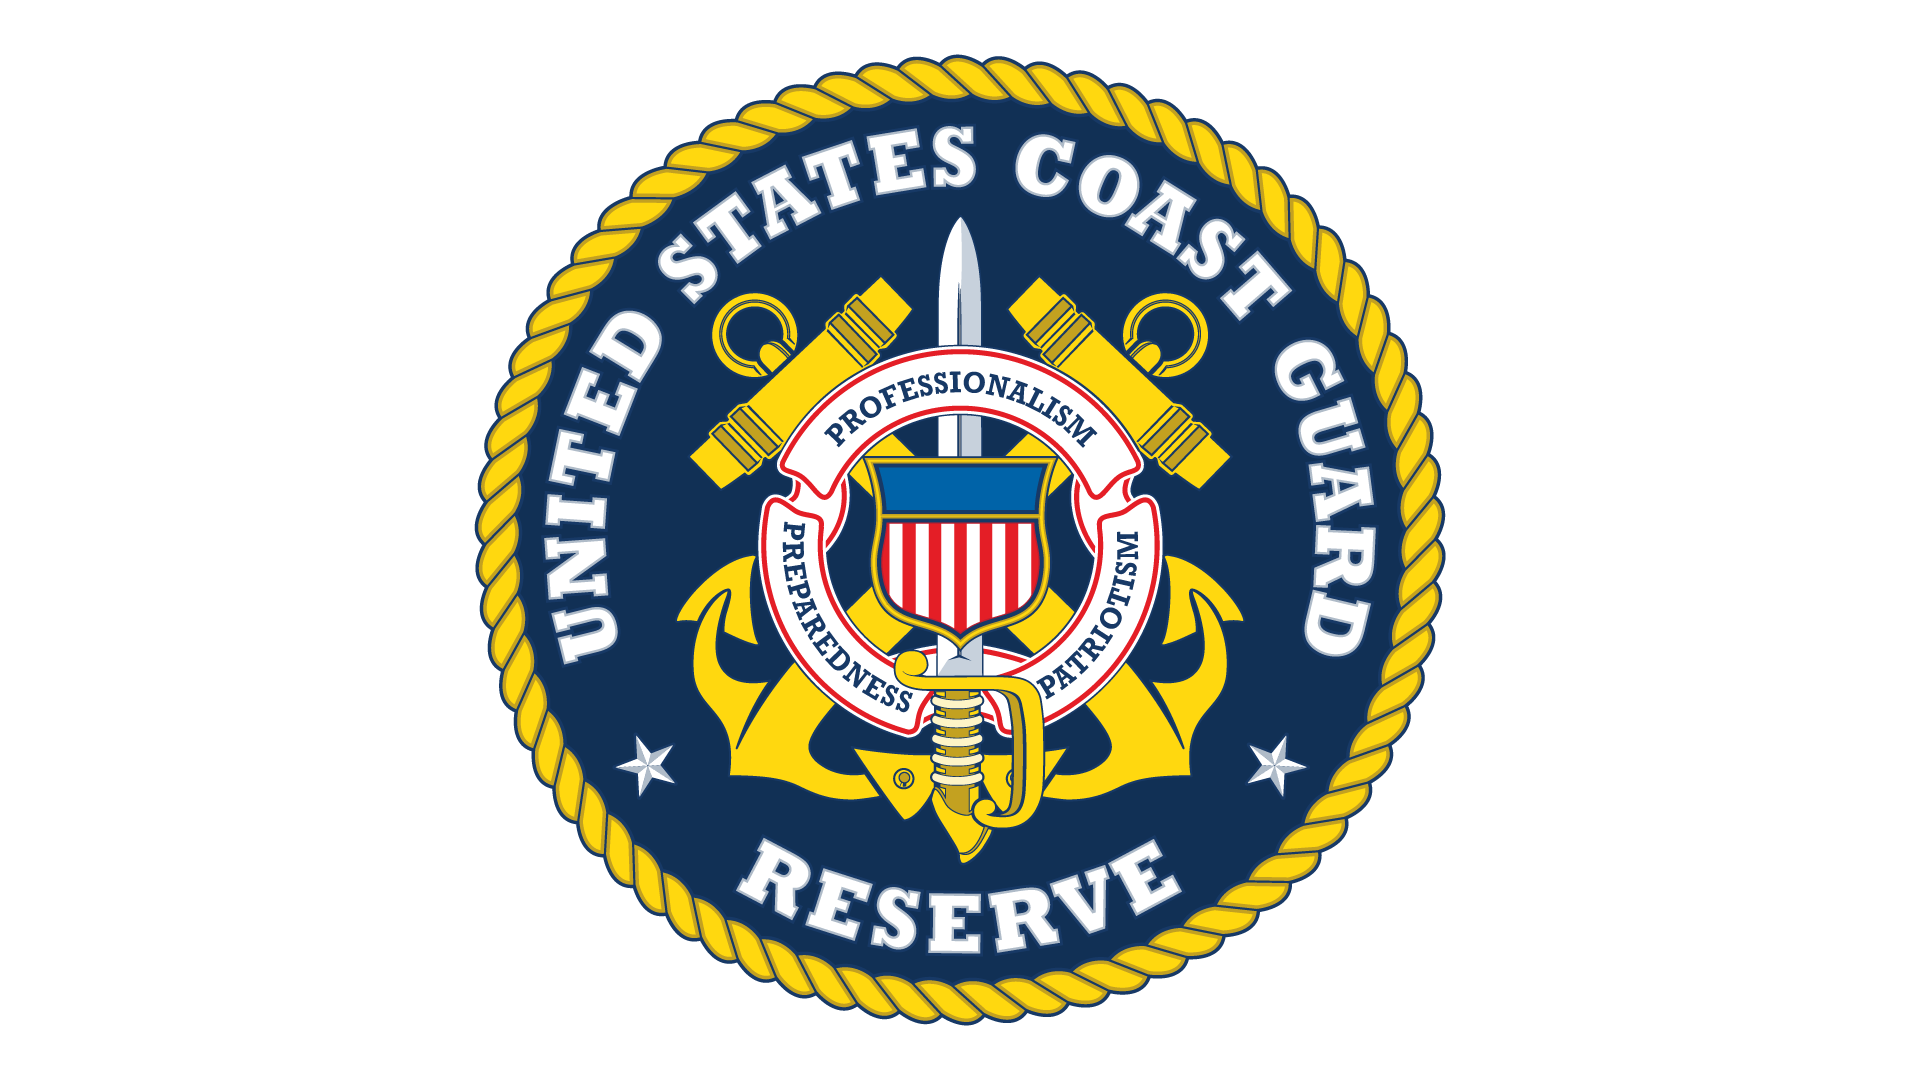 USCG-Reserves-emblem_1920.png